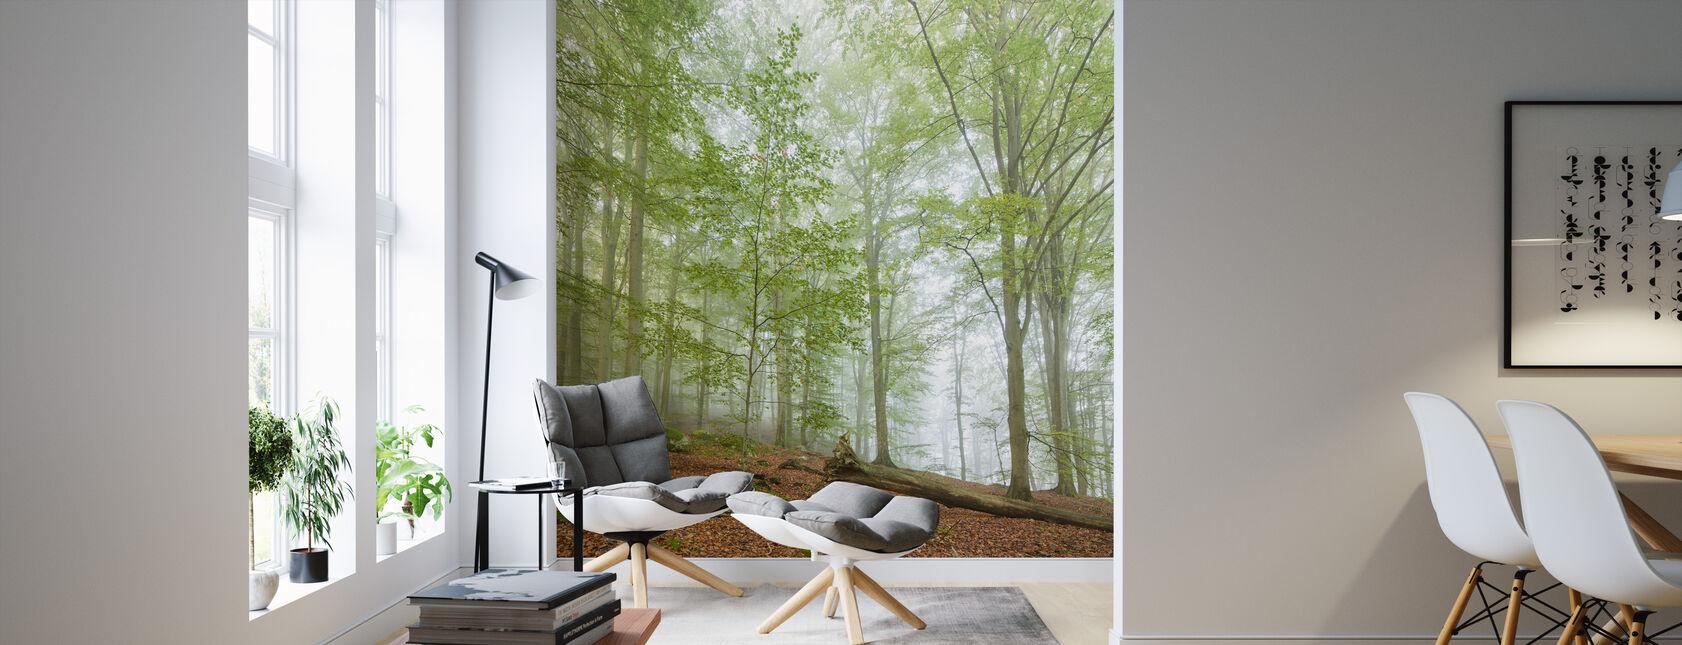 Swedish Beech Forest III - Wallpaper - Living Room